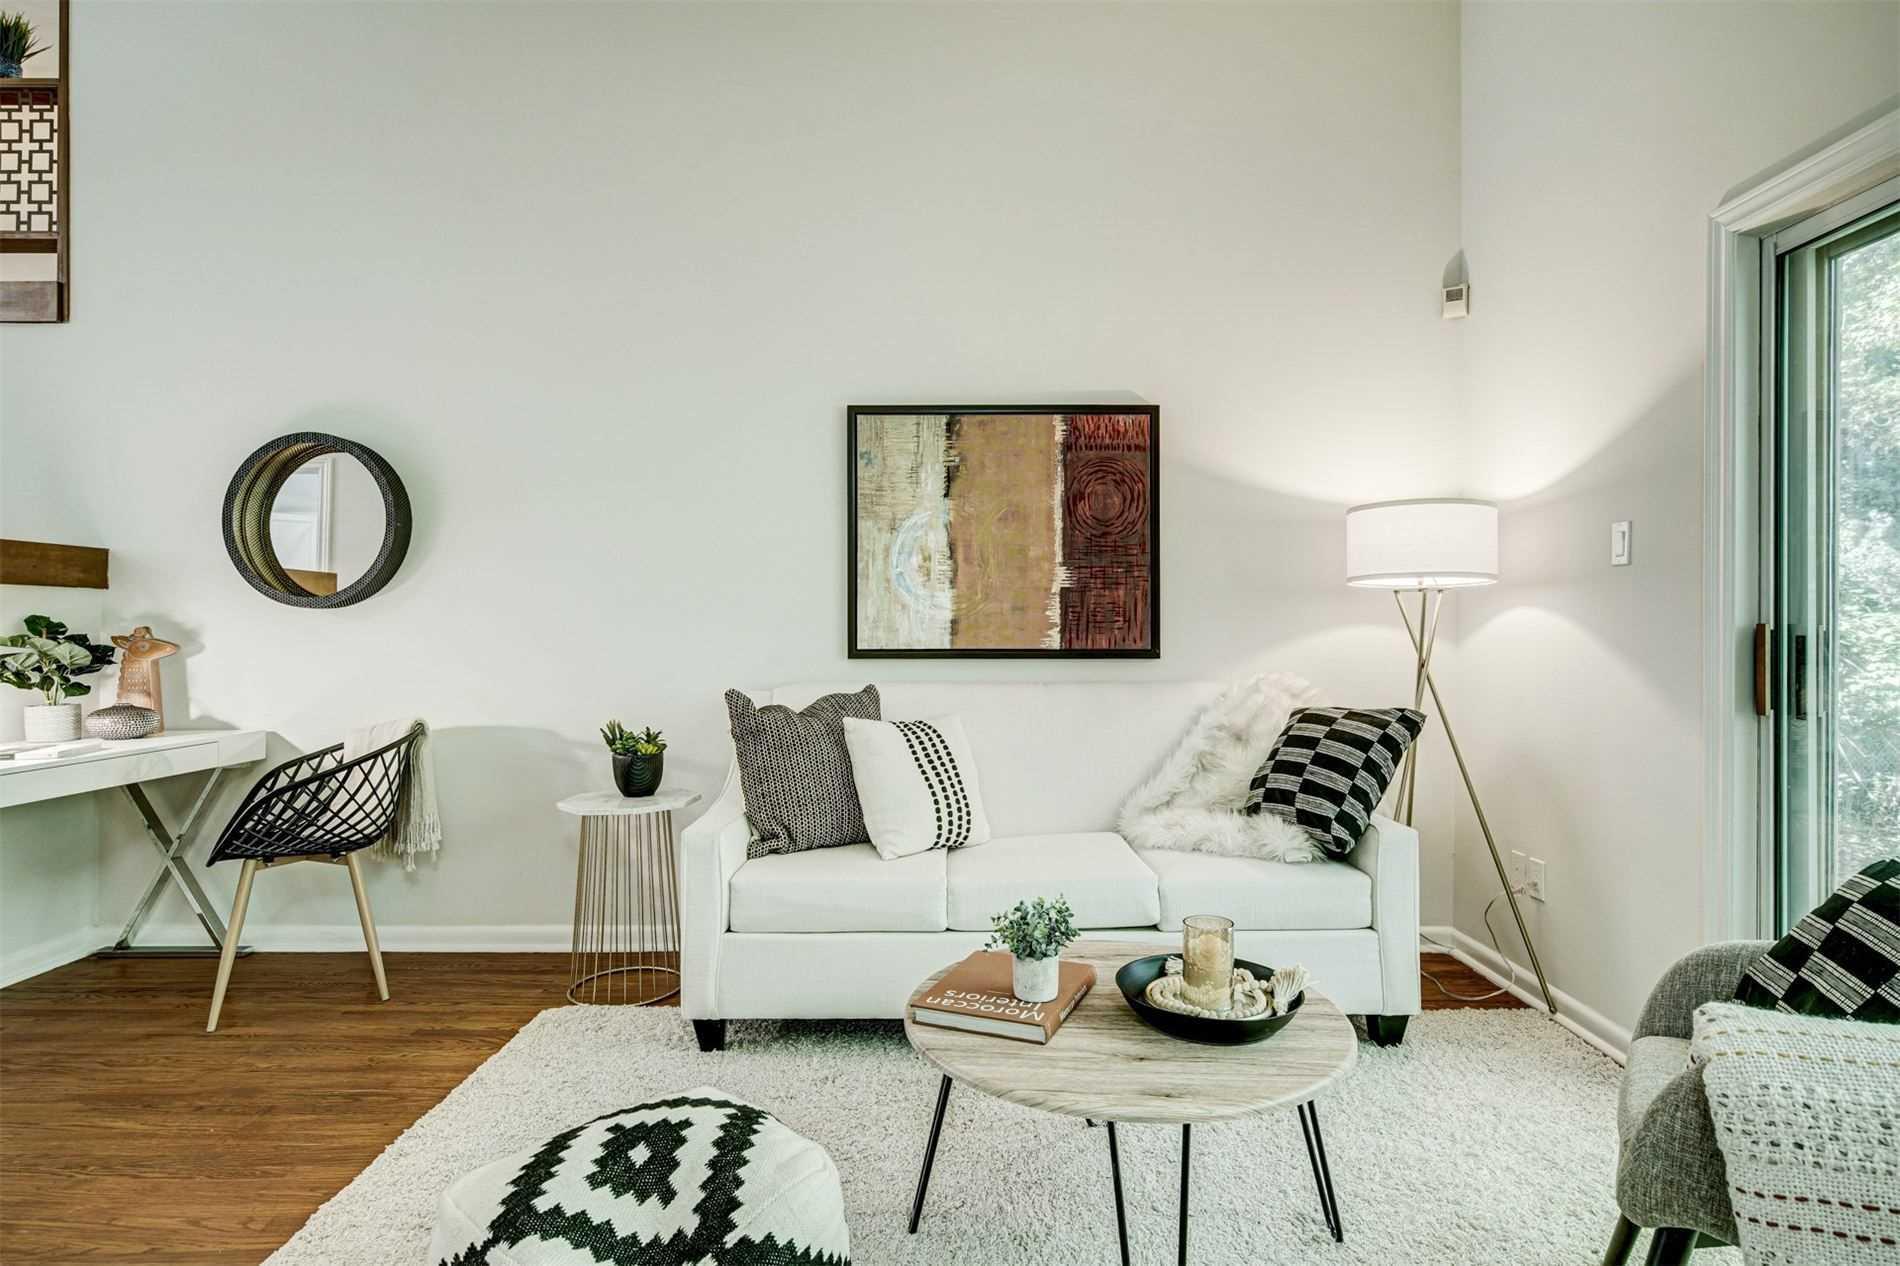 140 Verobeach Blvd - Humbermede Detached for sale, 3 Bedrooms (W5385046) - #3